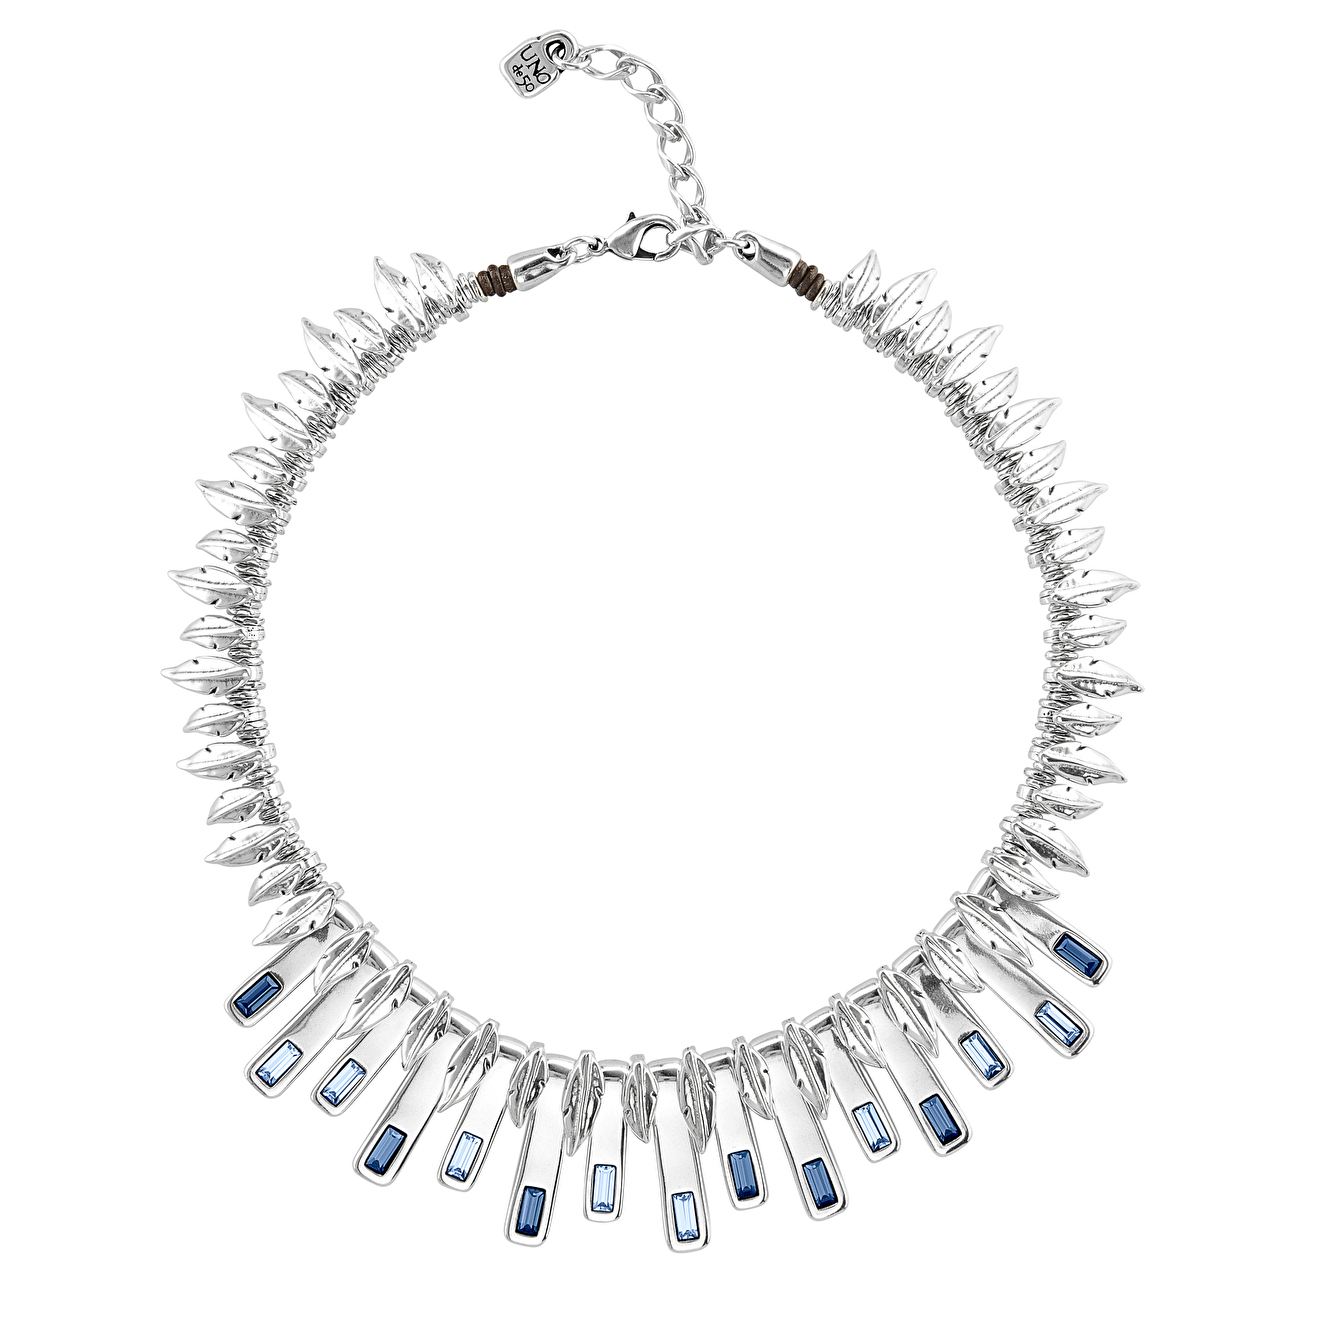 Unode50 Колье «Little Nightbird» с синими кристаллами, покрытое серебром